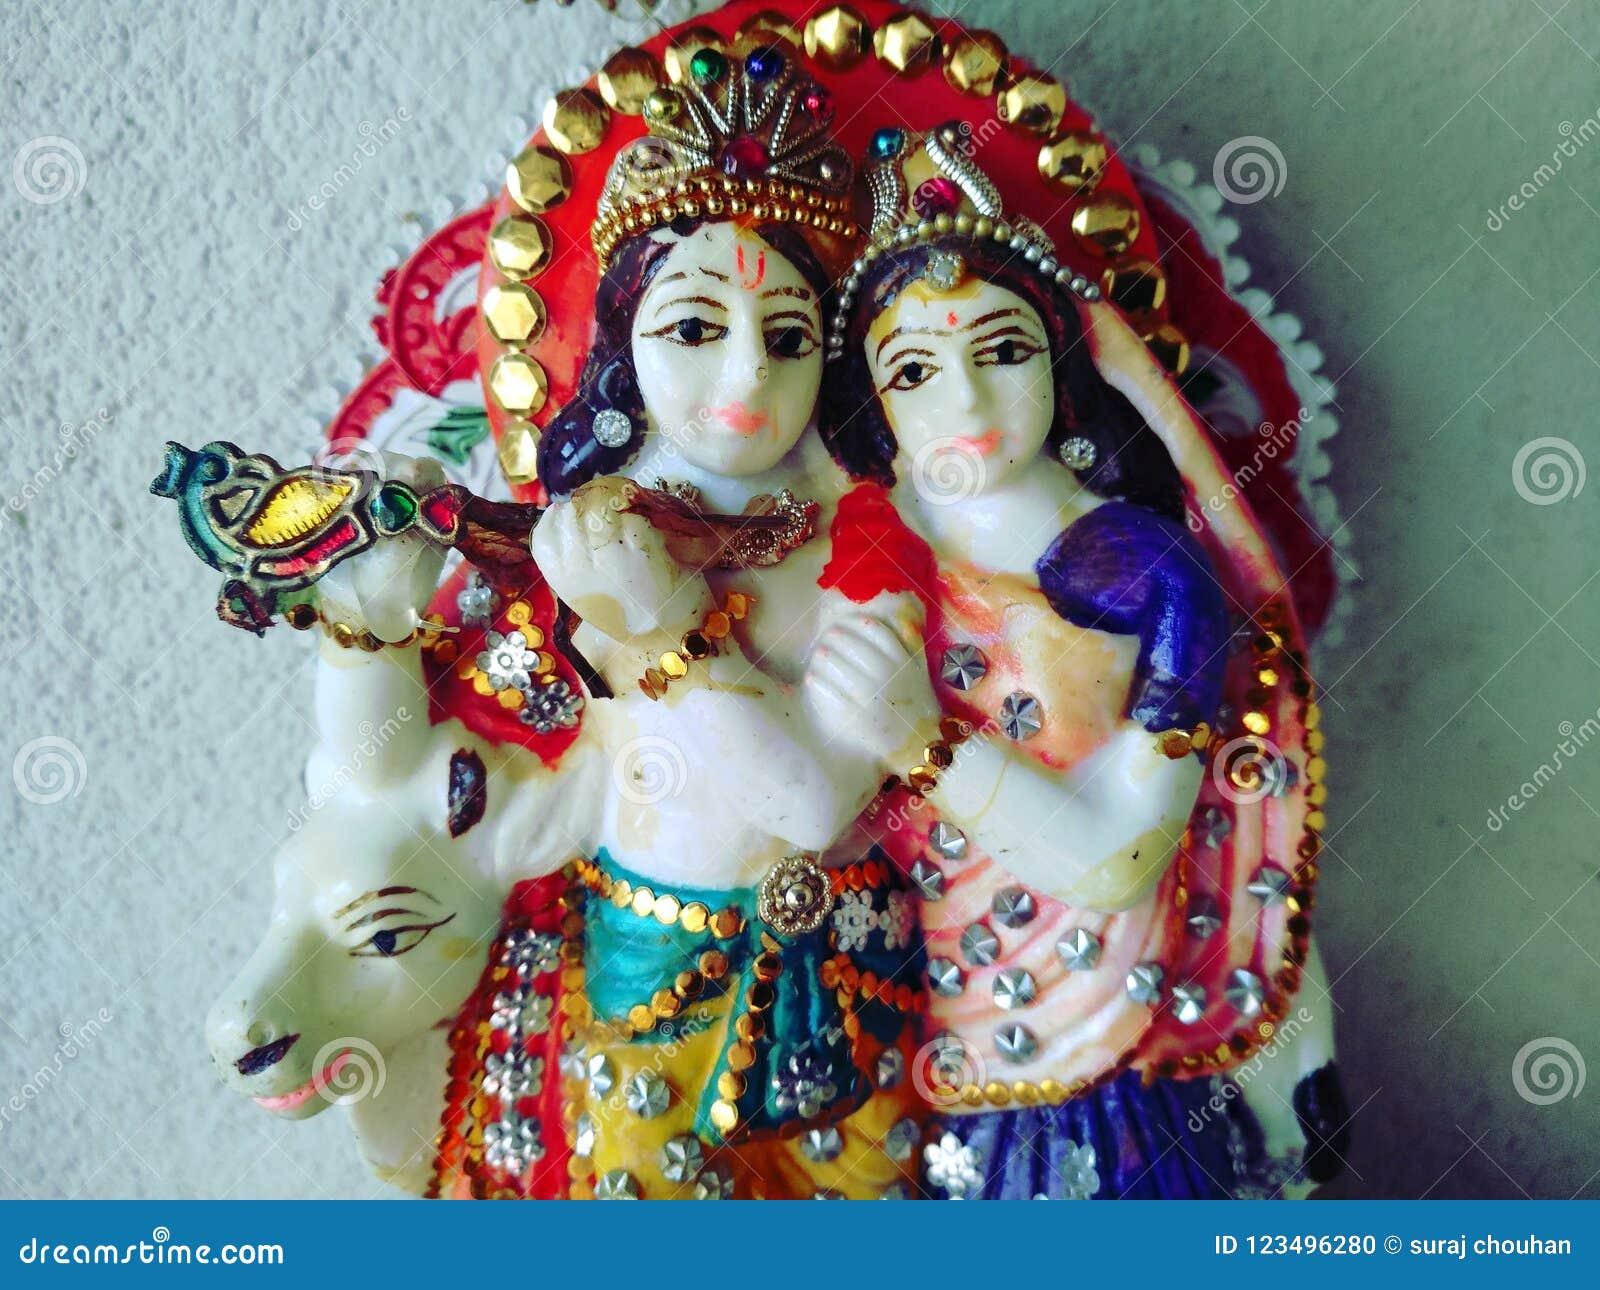 The lord editorial image  Image of lord, shree, nandi - 123496280